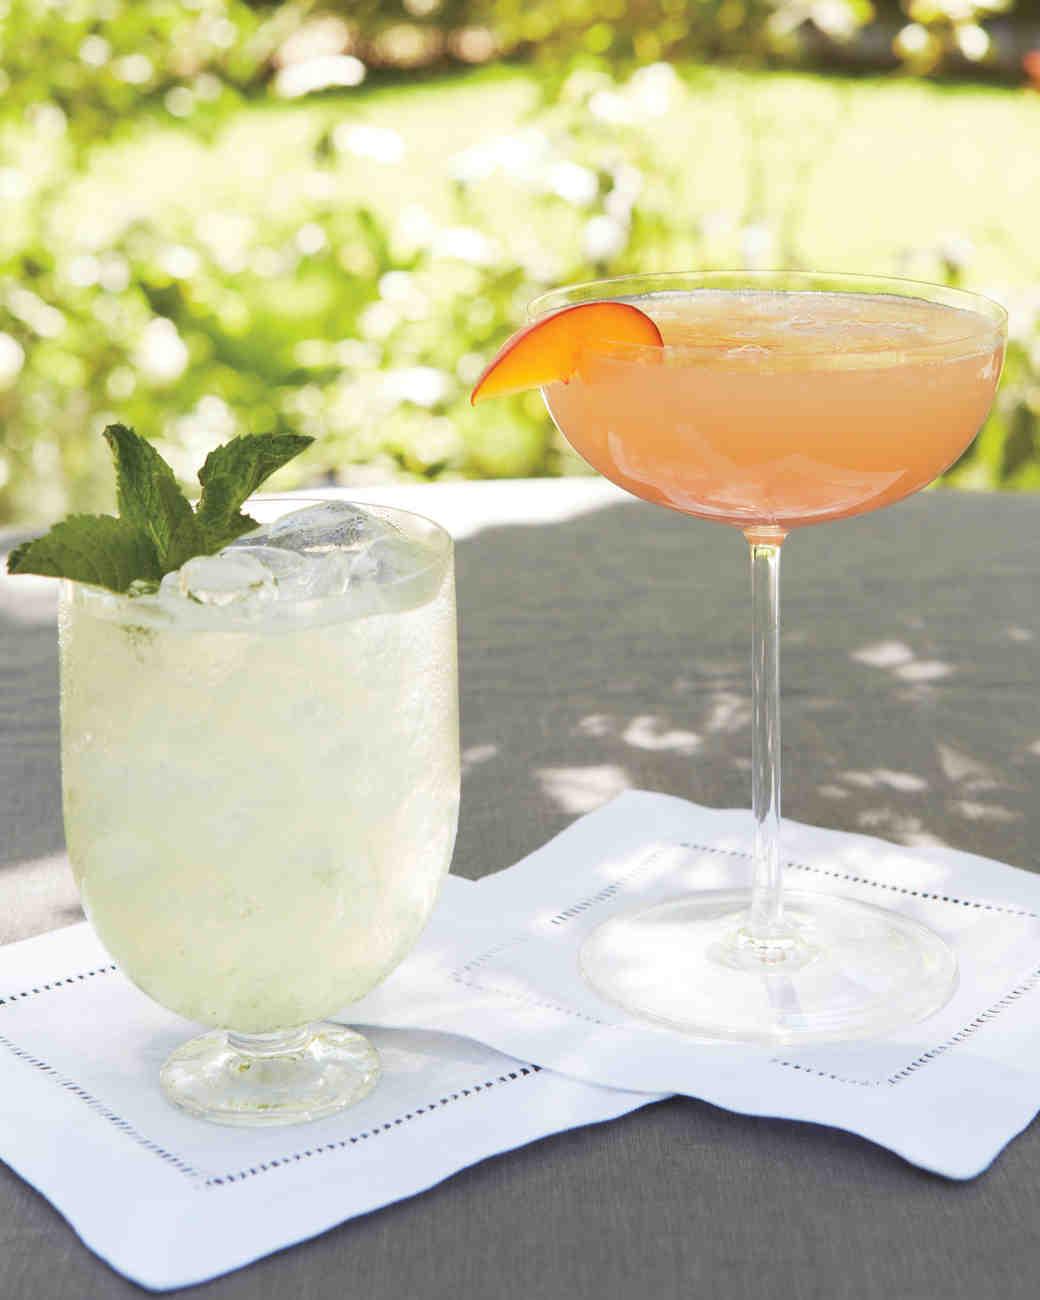 cocktails-mwd109296.jpg